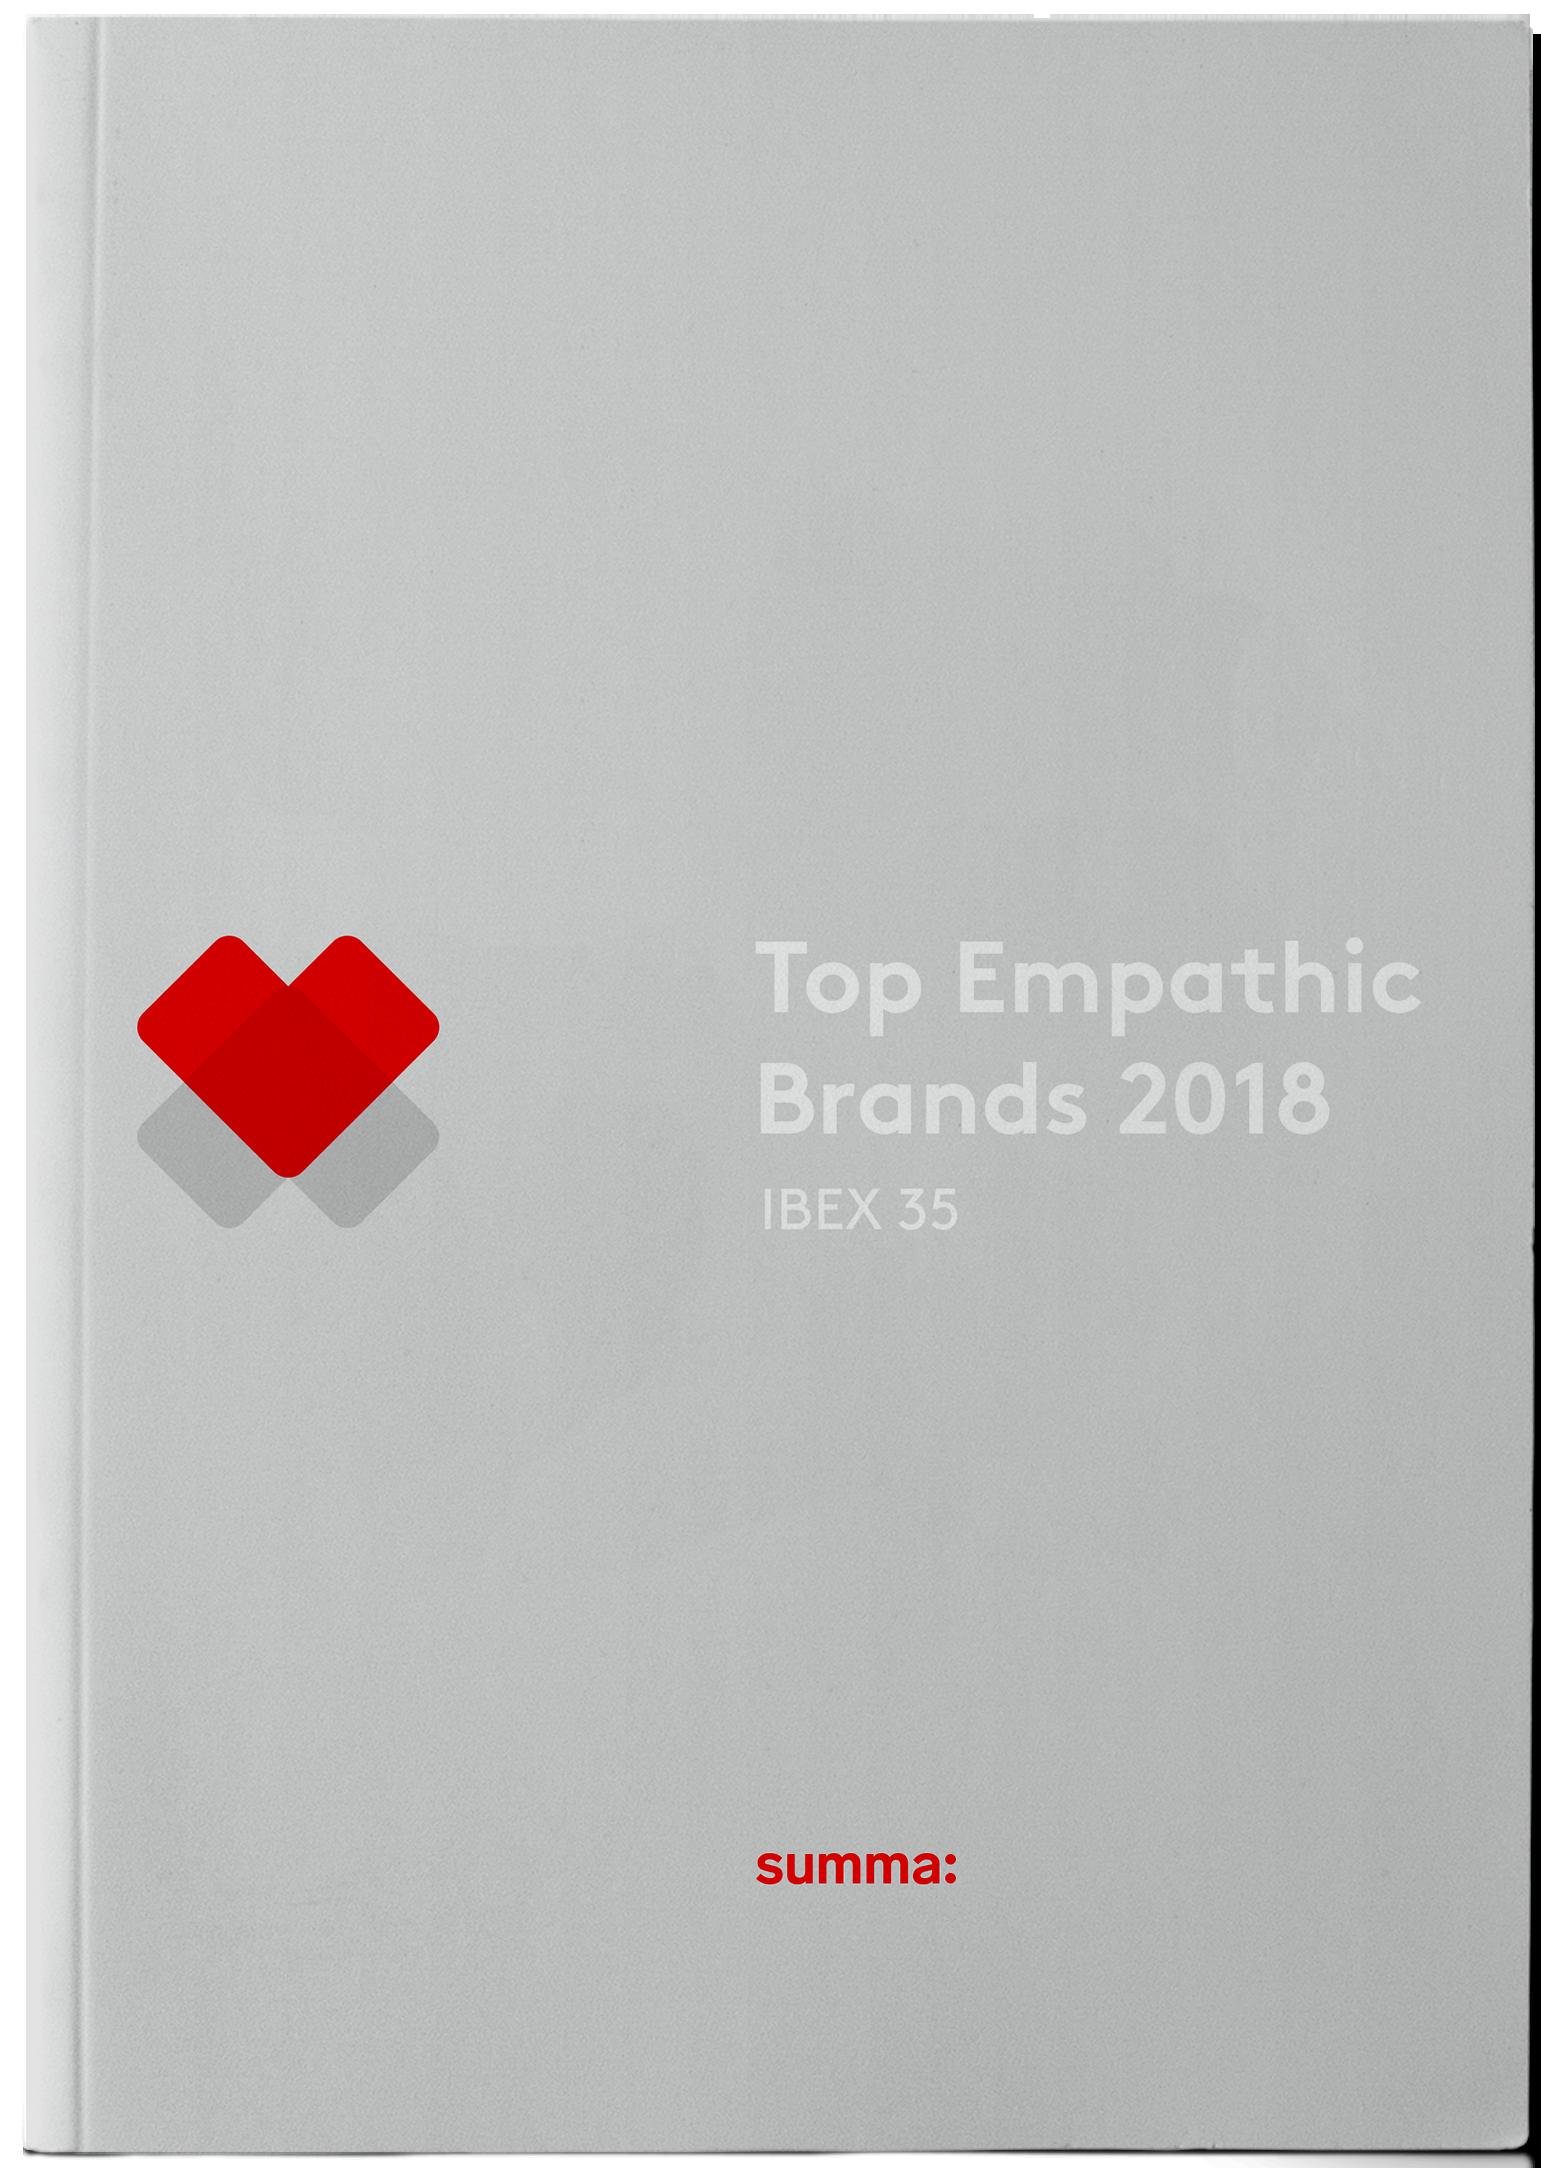 Top Empathic Brands - IBEX35